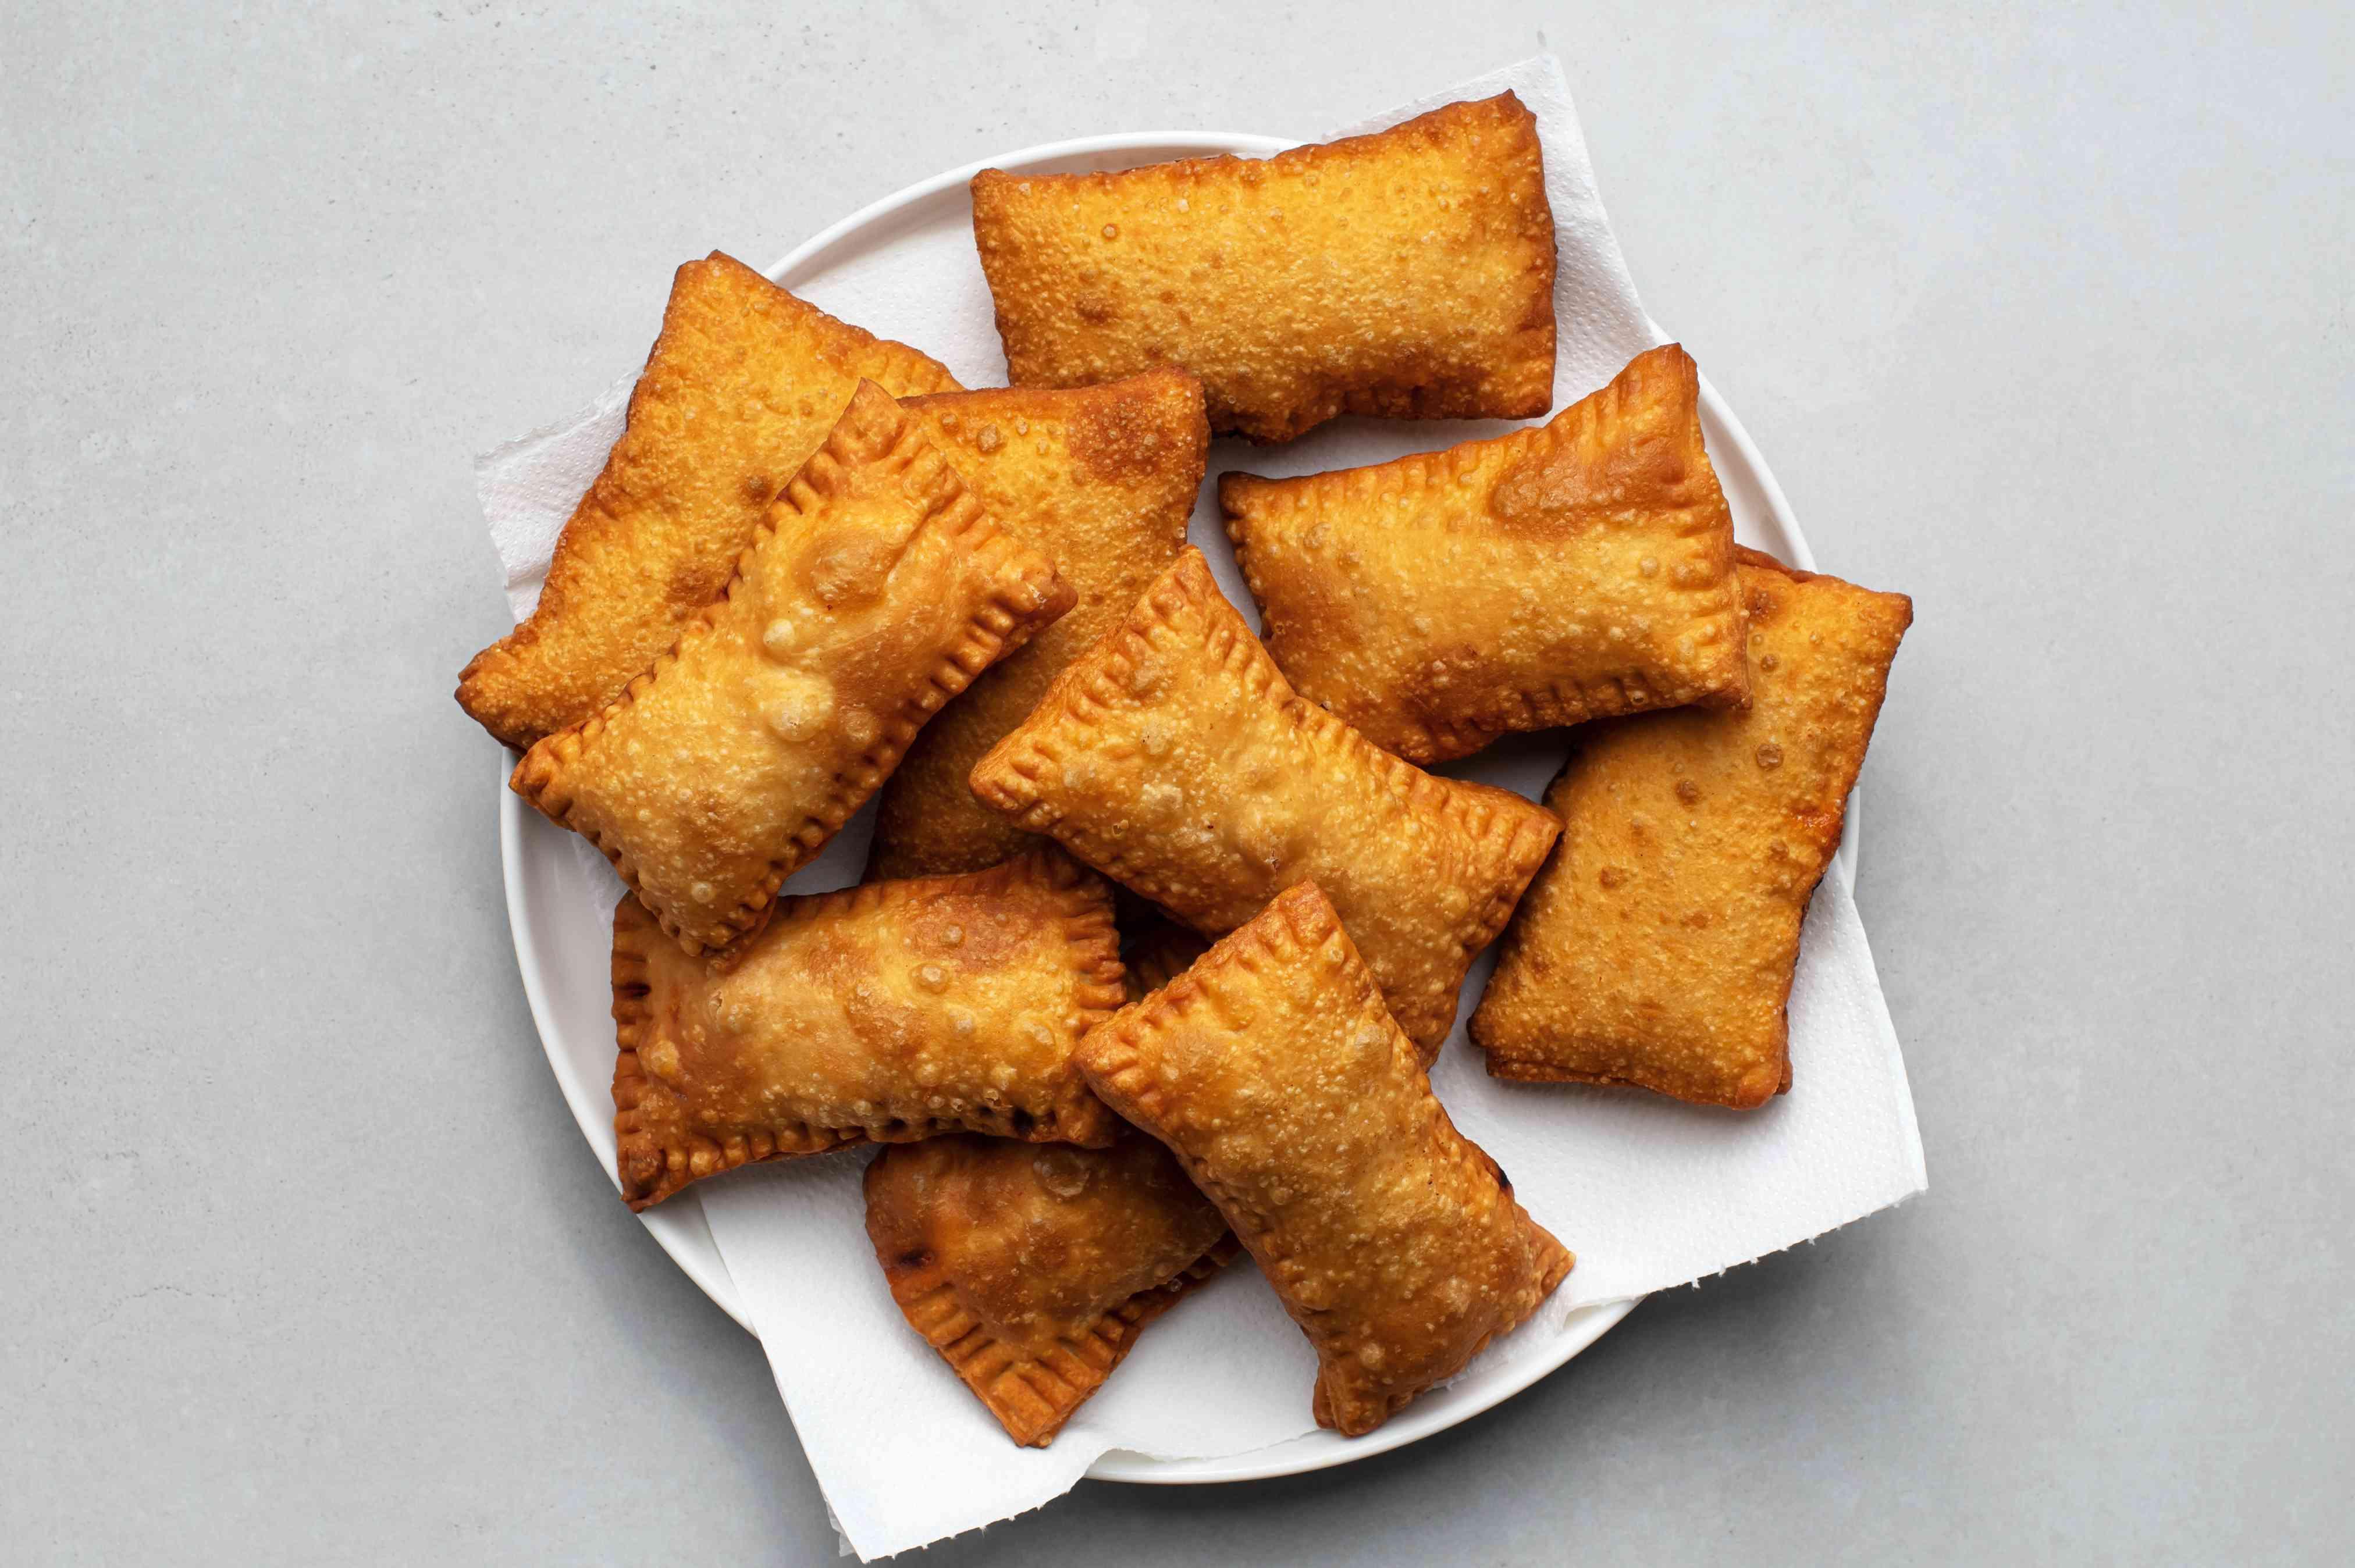 Brazilian Pasteis With Chicken (Pastel Frito de Frango) on a plate